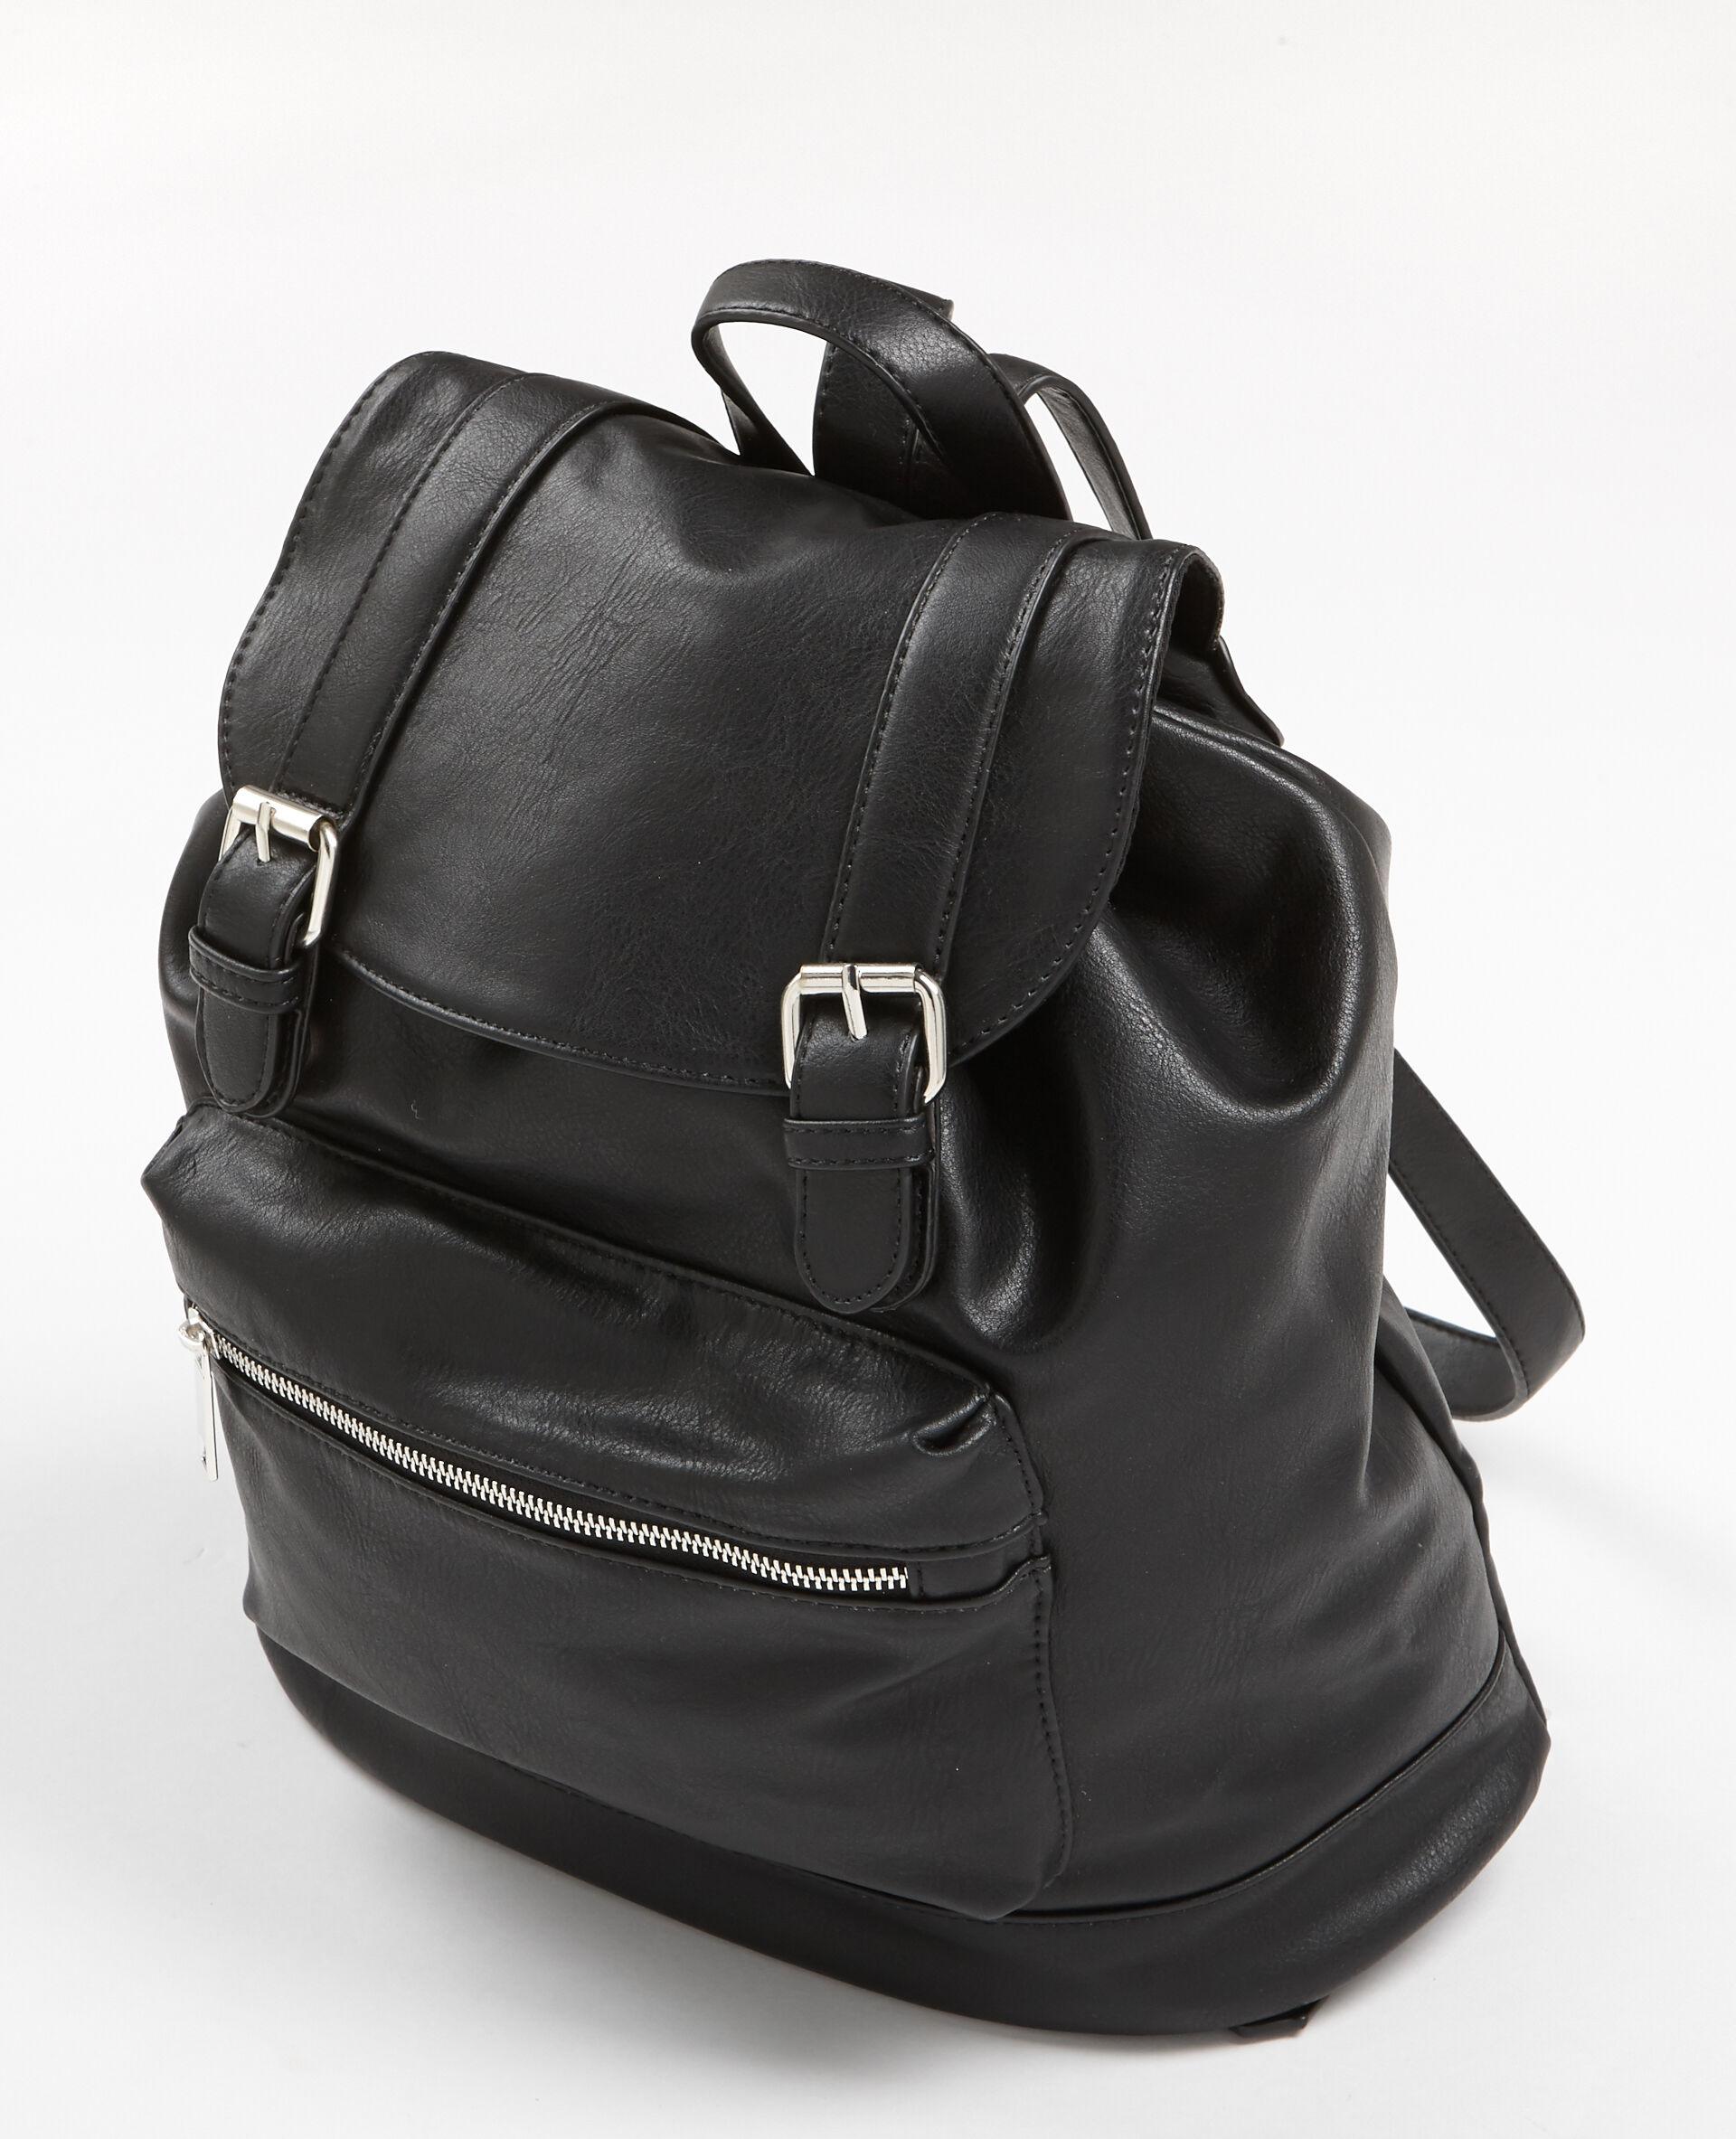 sac à dos cuir femme pimkie